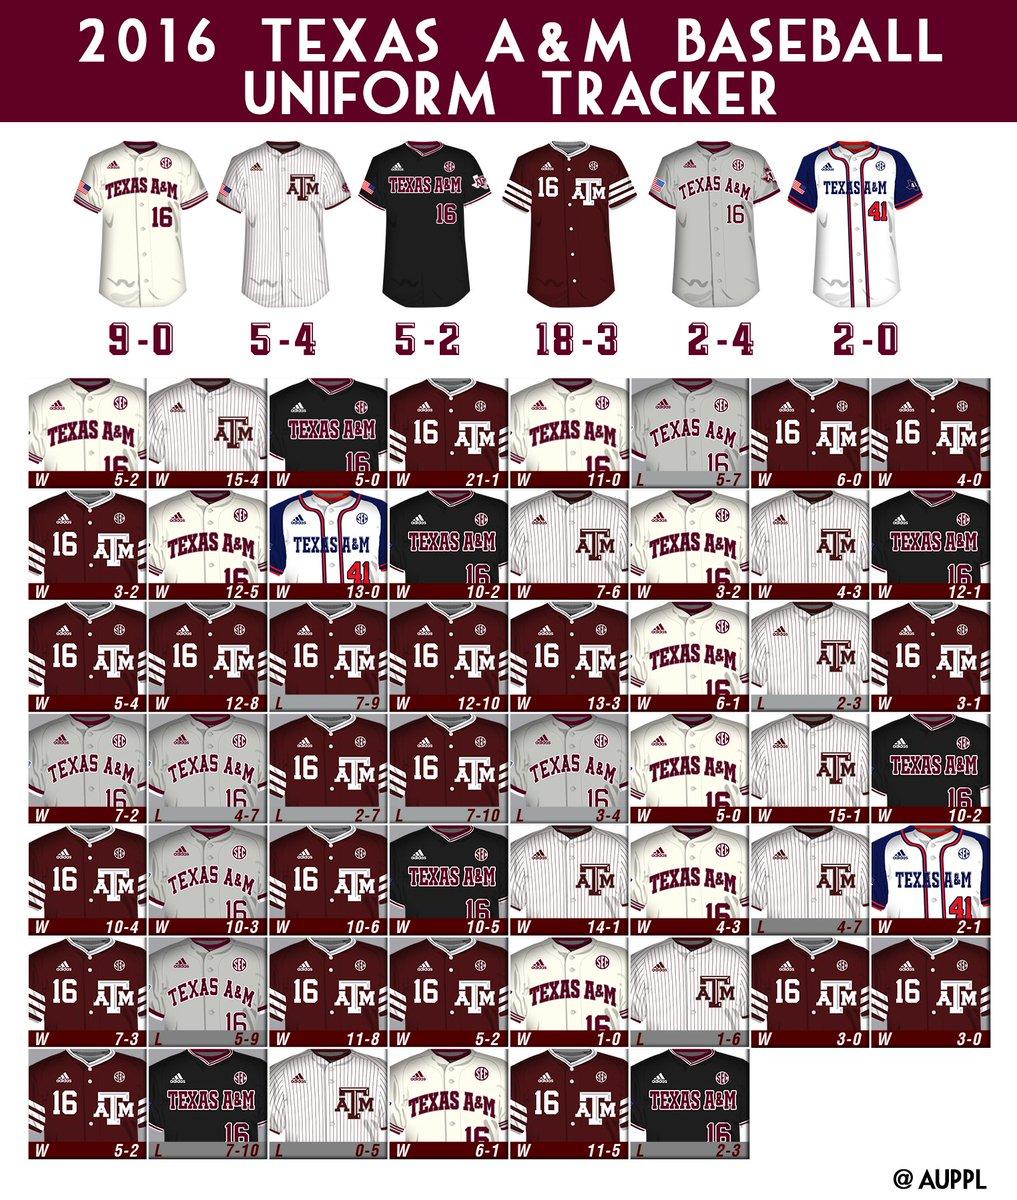 2016 Texas A&M Aggies Baseball Uniform Tracker https://t.co/2qJDxthccT